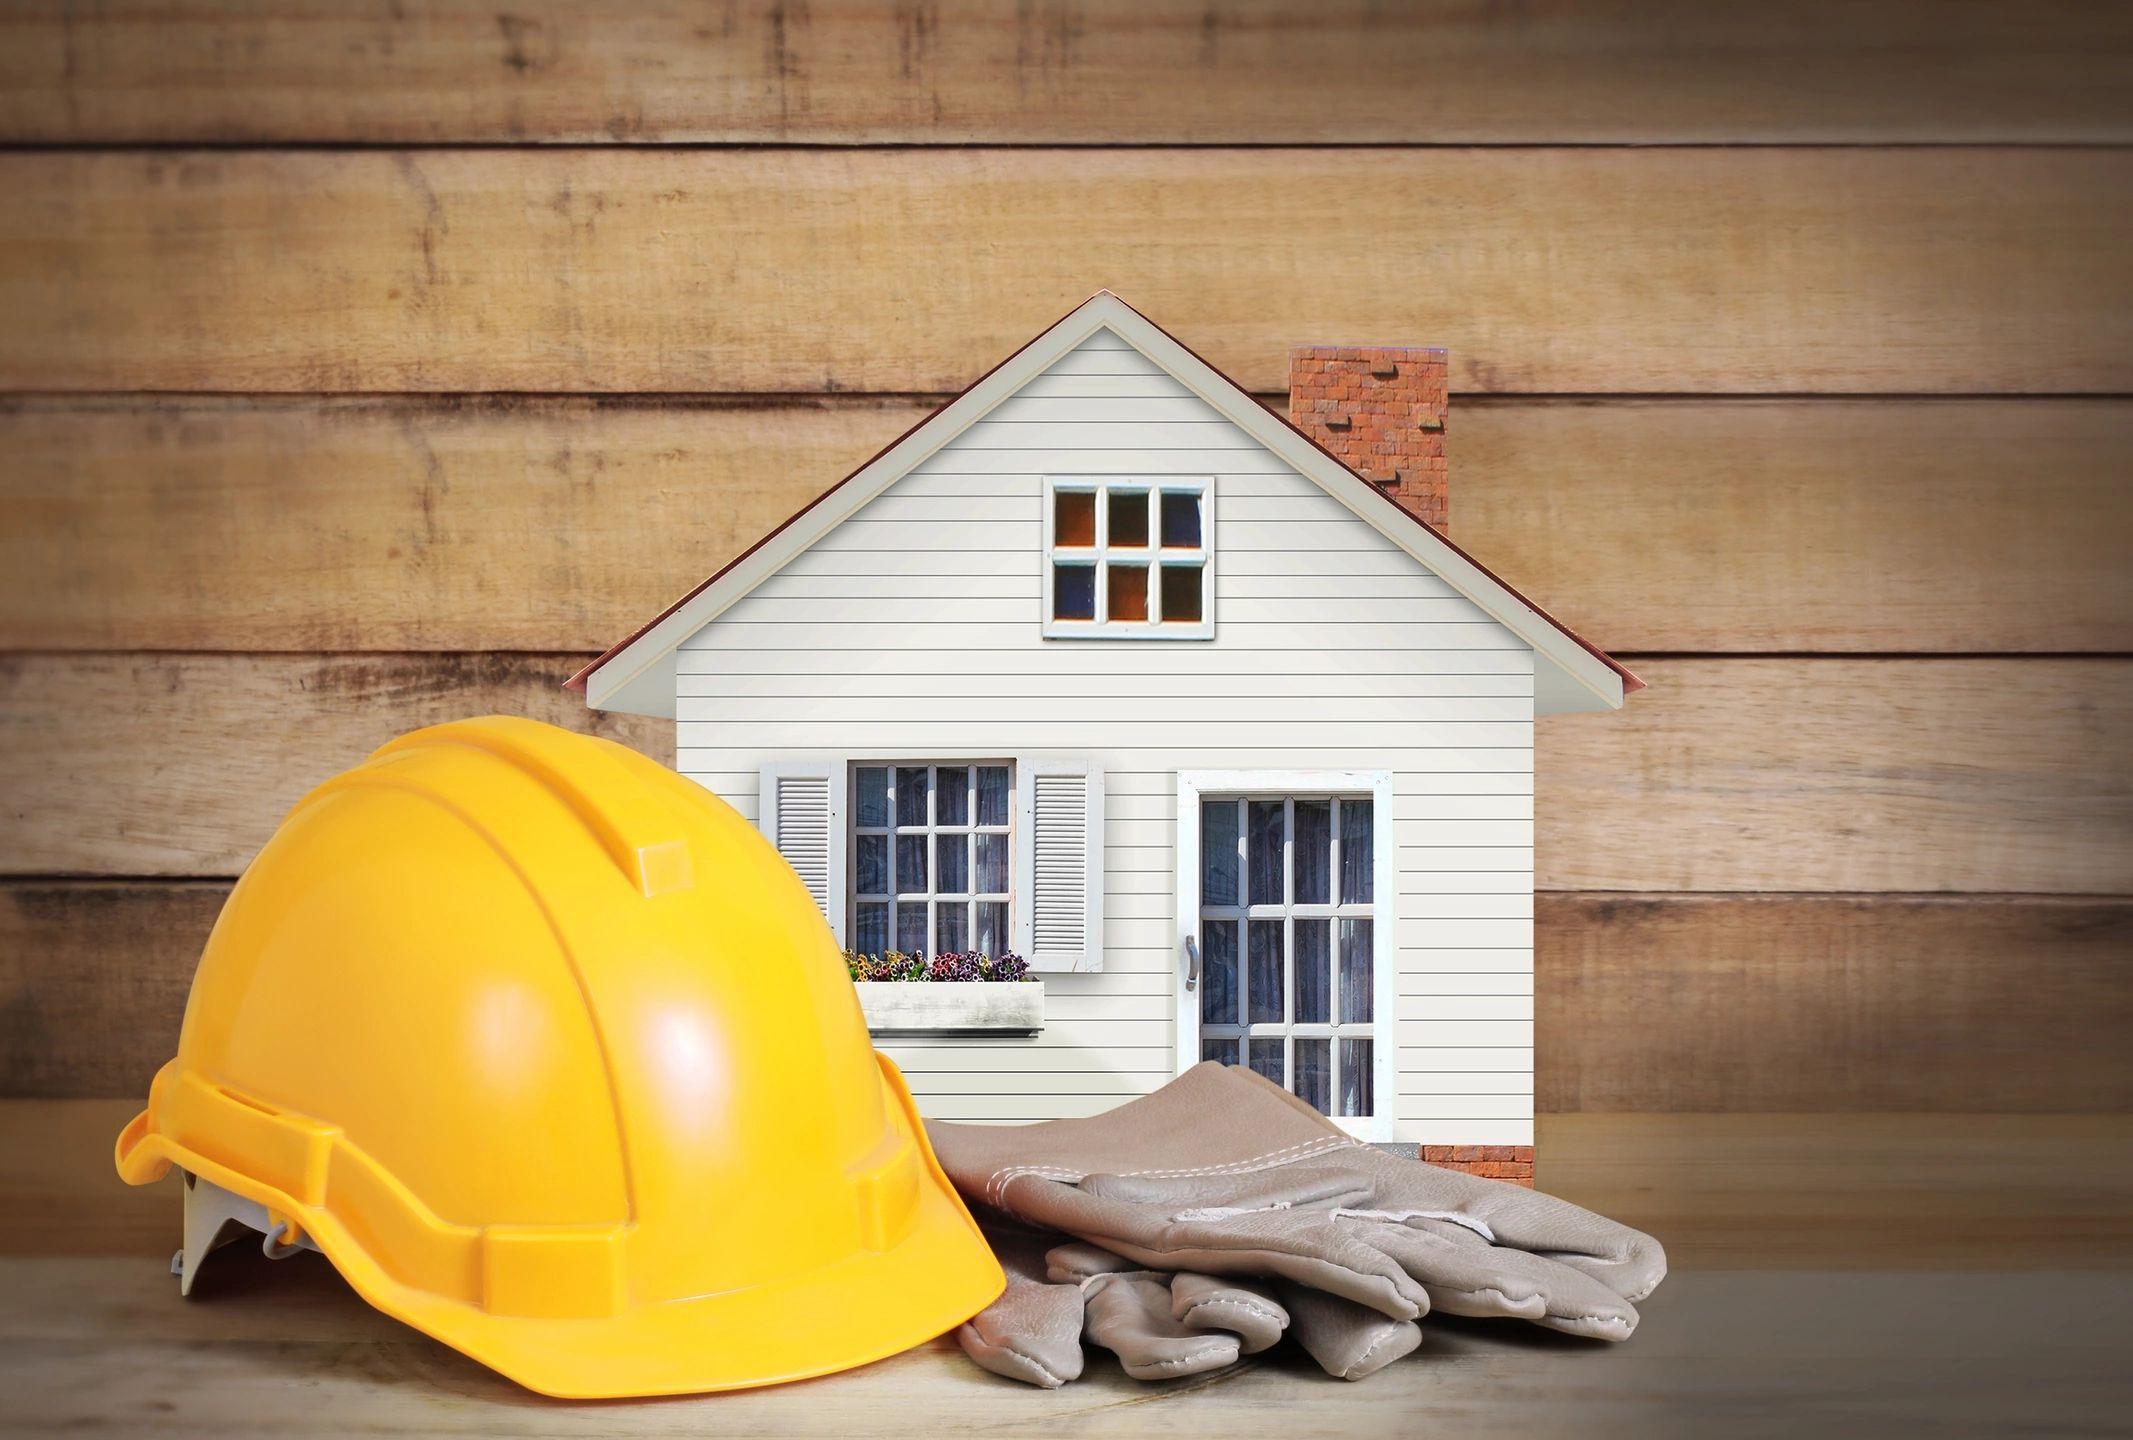 Housing Improvement and Development Services